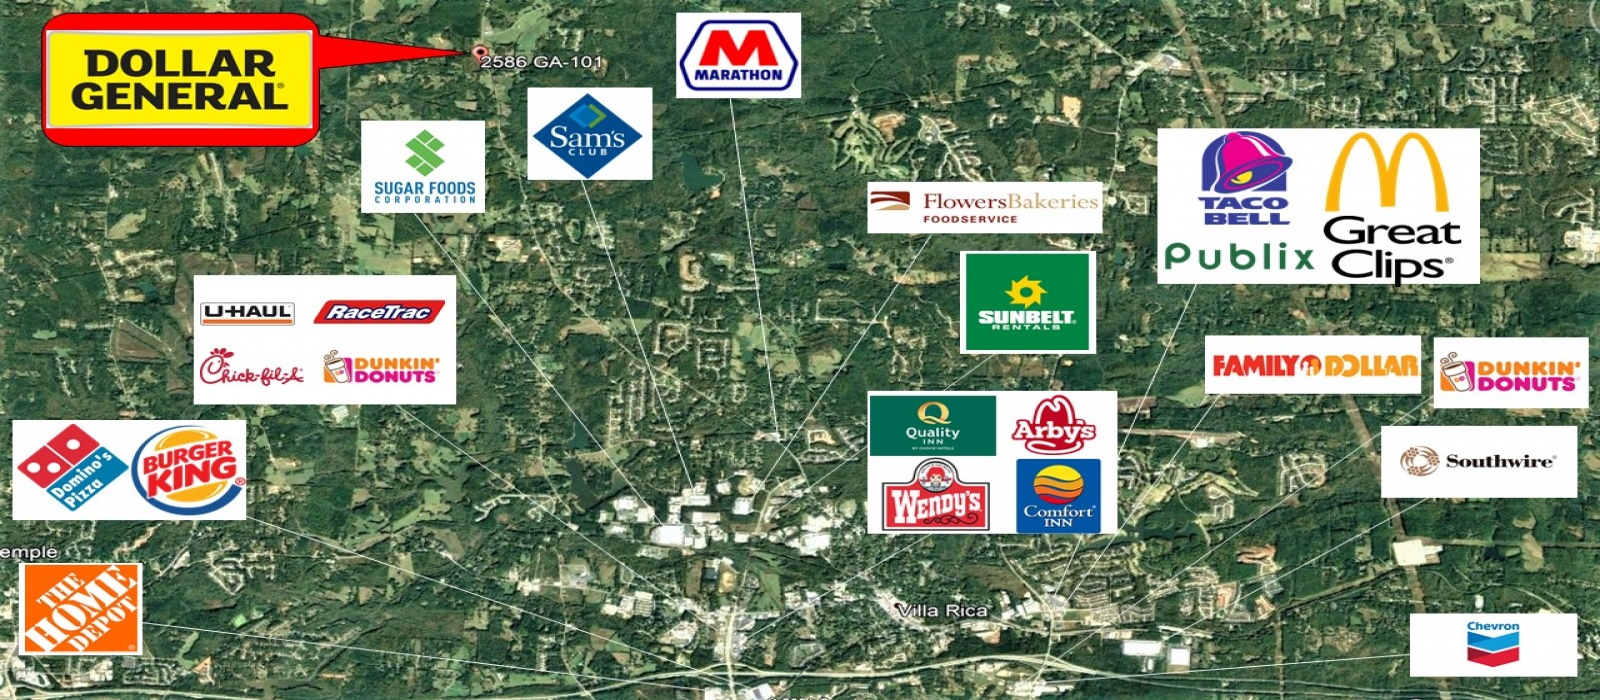 2586 Highway 101 S, Villa Rica, Georgia 30180, ,Retail,For Sale,2586 Highway 101 S,1049